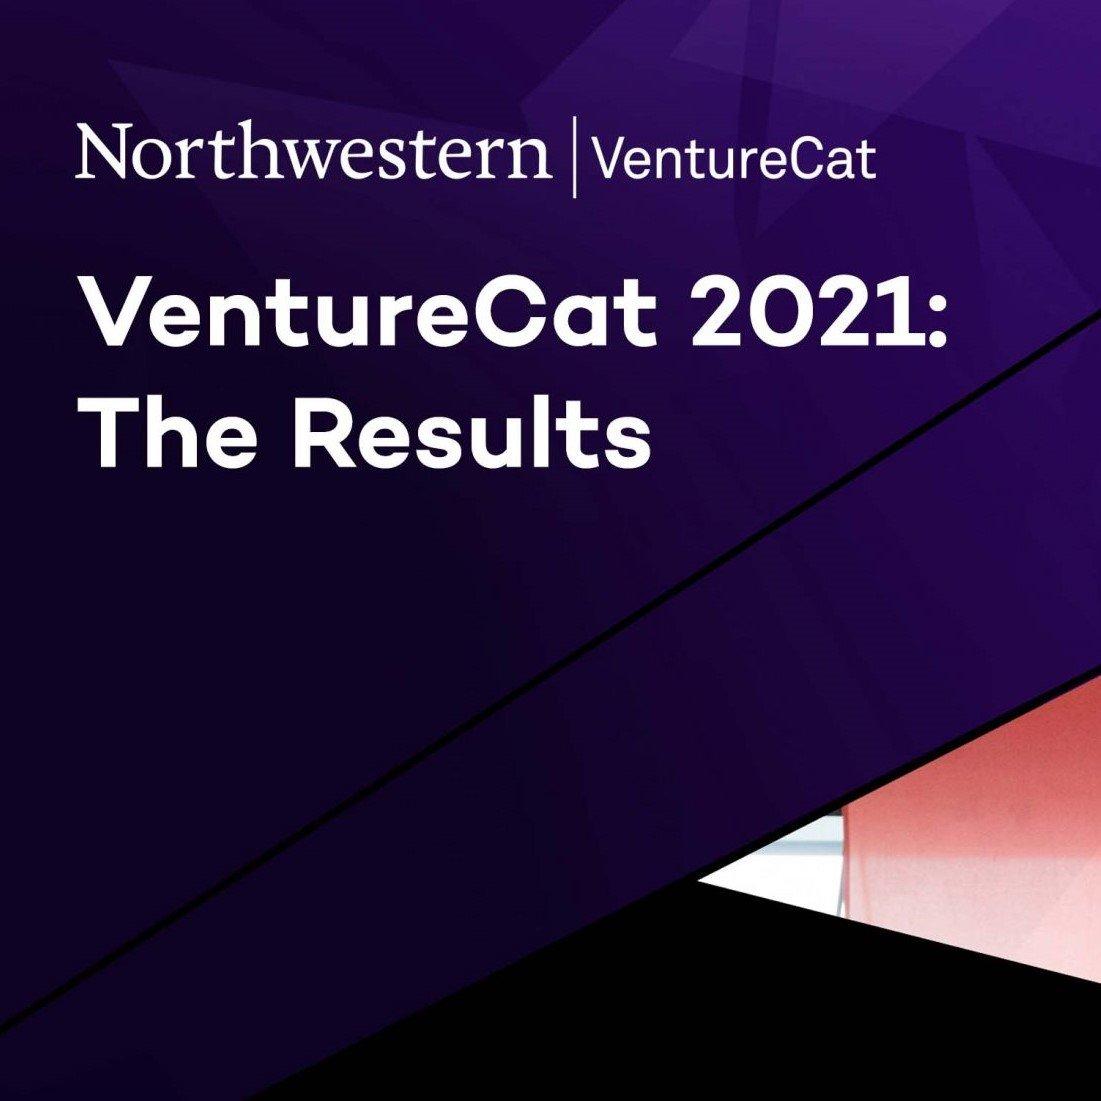 Verboso wins 2nd in Life Sciences & Medical Innovations at Northwestern's VentureCat